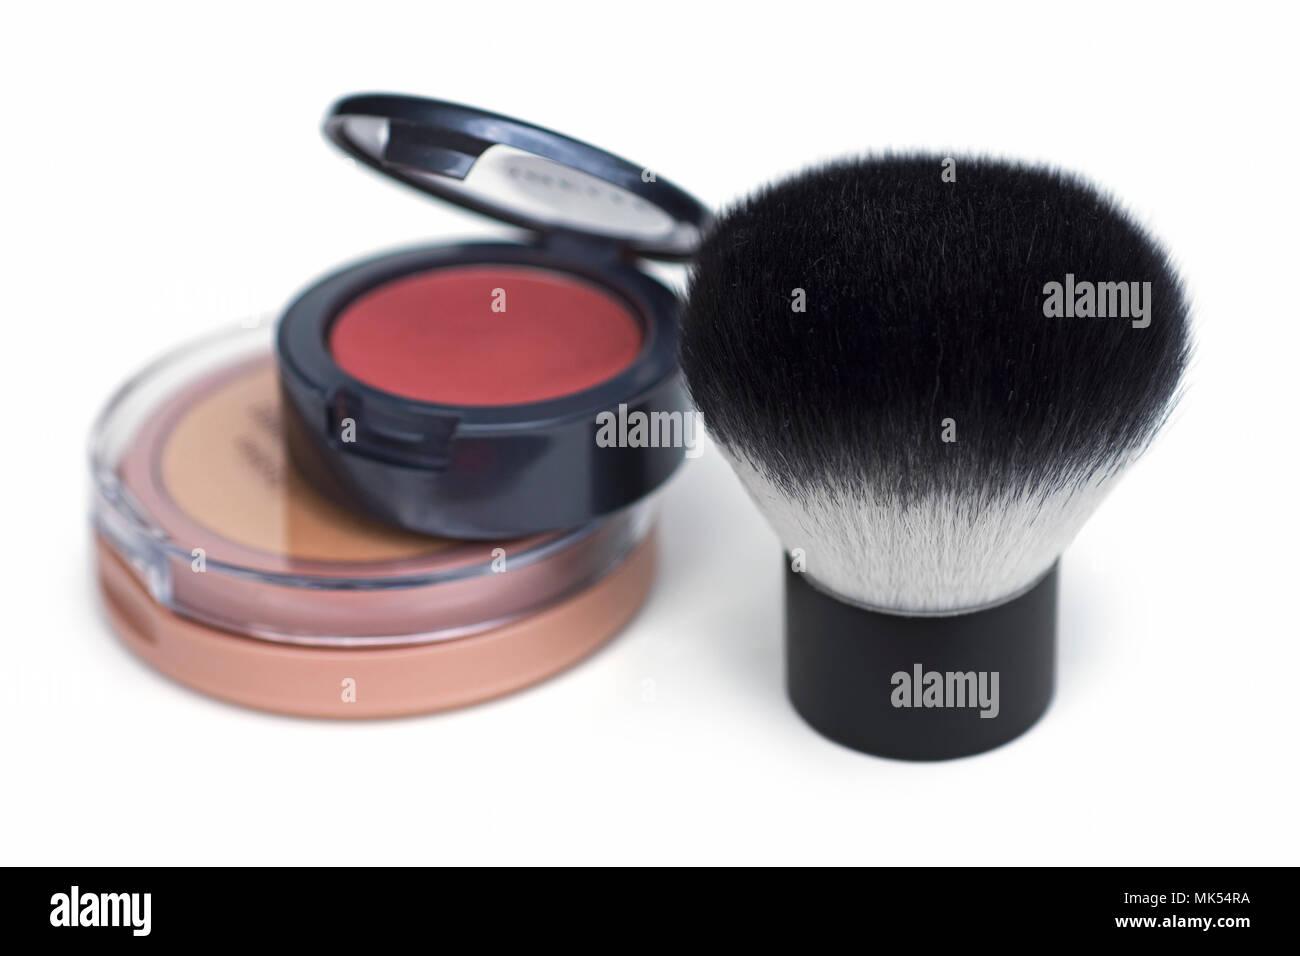 Kabuki Pinsel, Kosmetik, Puder, Make-up, Kosmetische Kompakt Stockbild